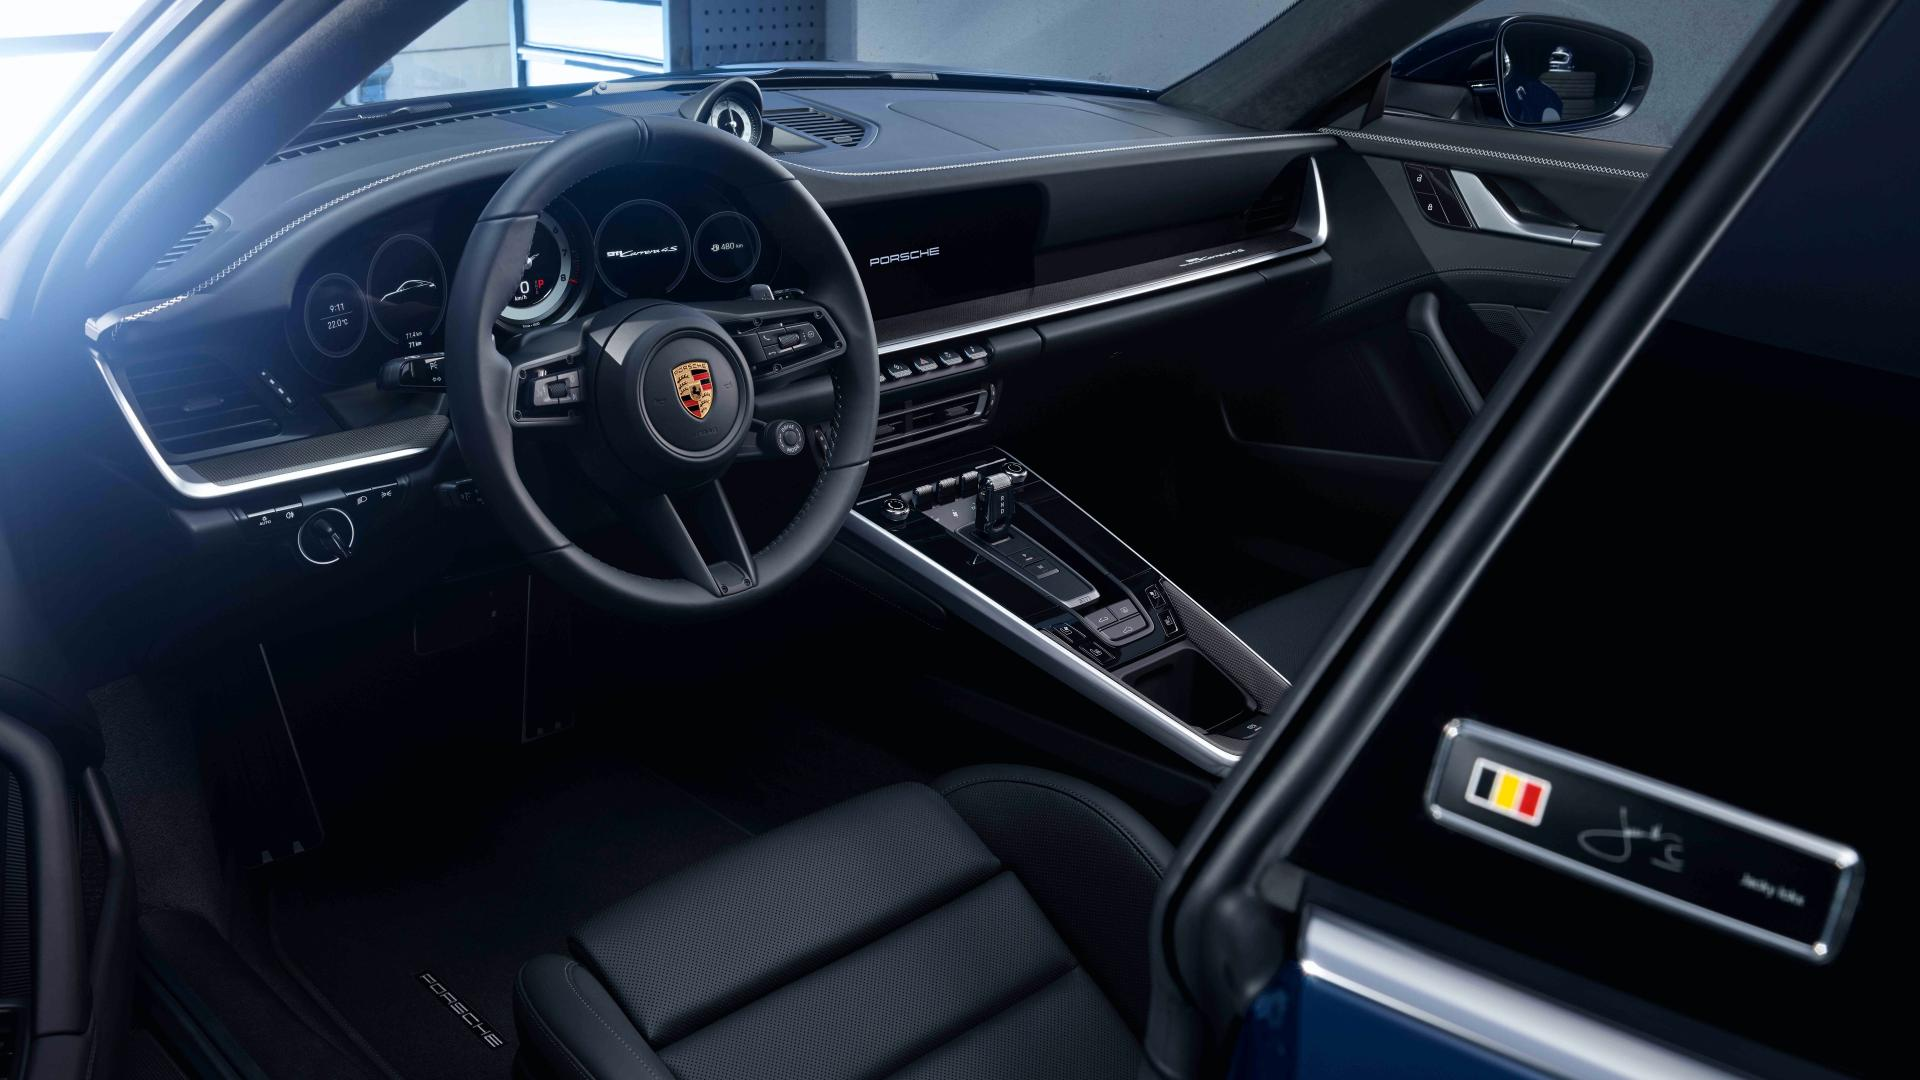 Porsche-911-Belgian-Legend-Edition-2020-Jacky-Ickx-16